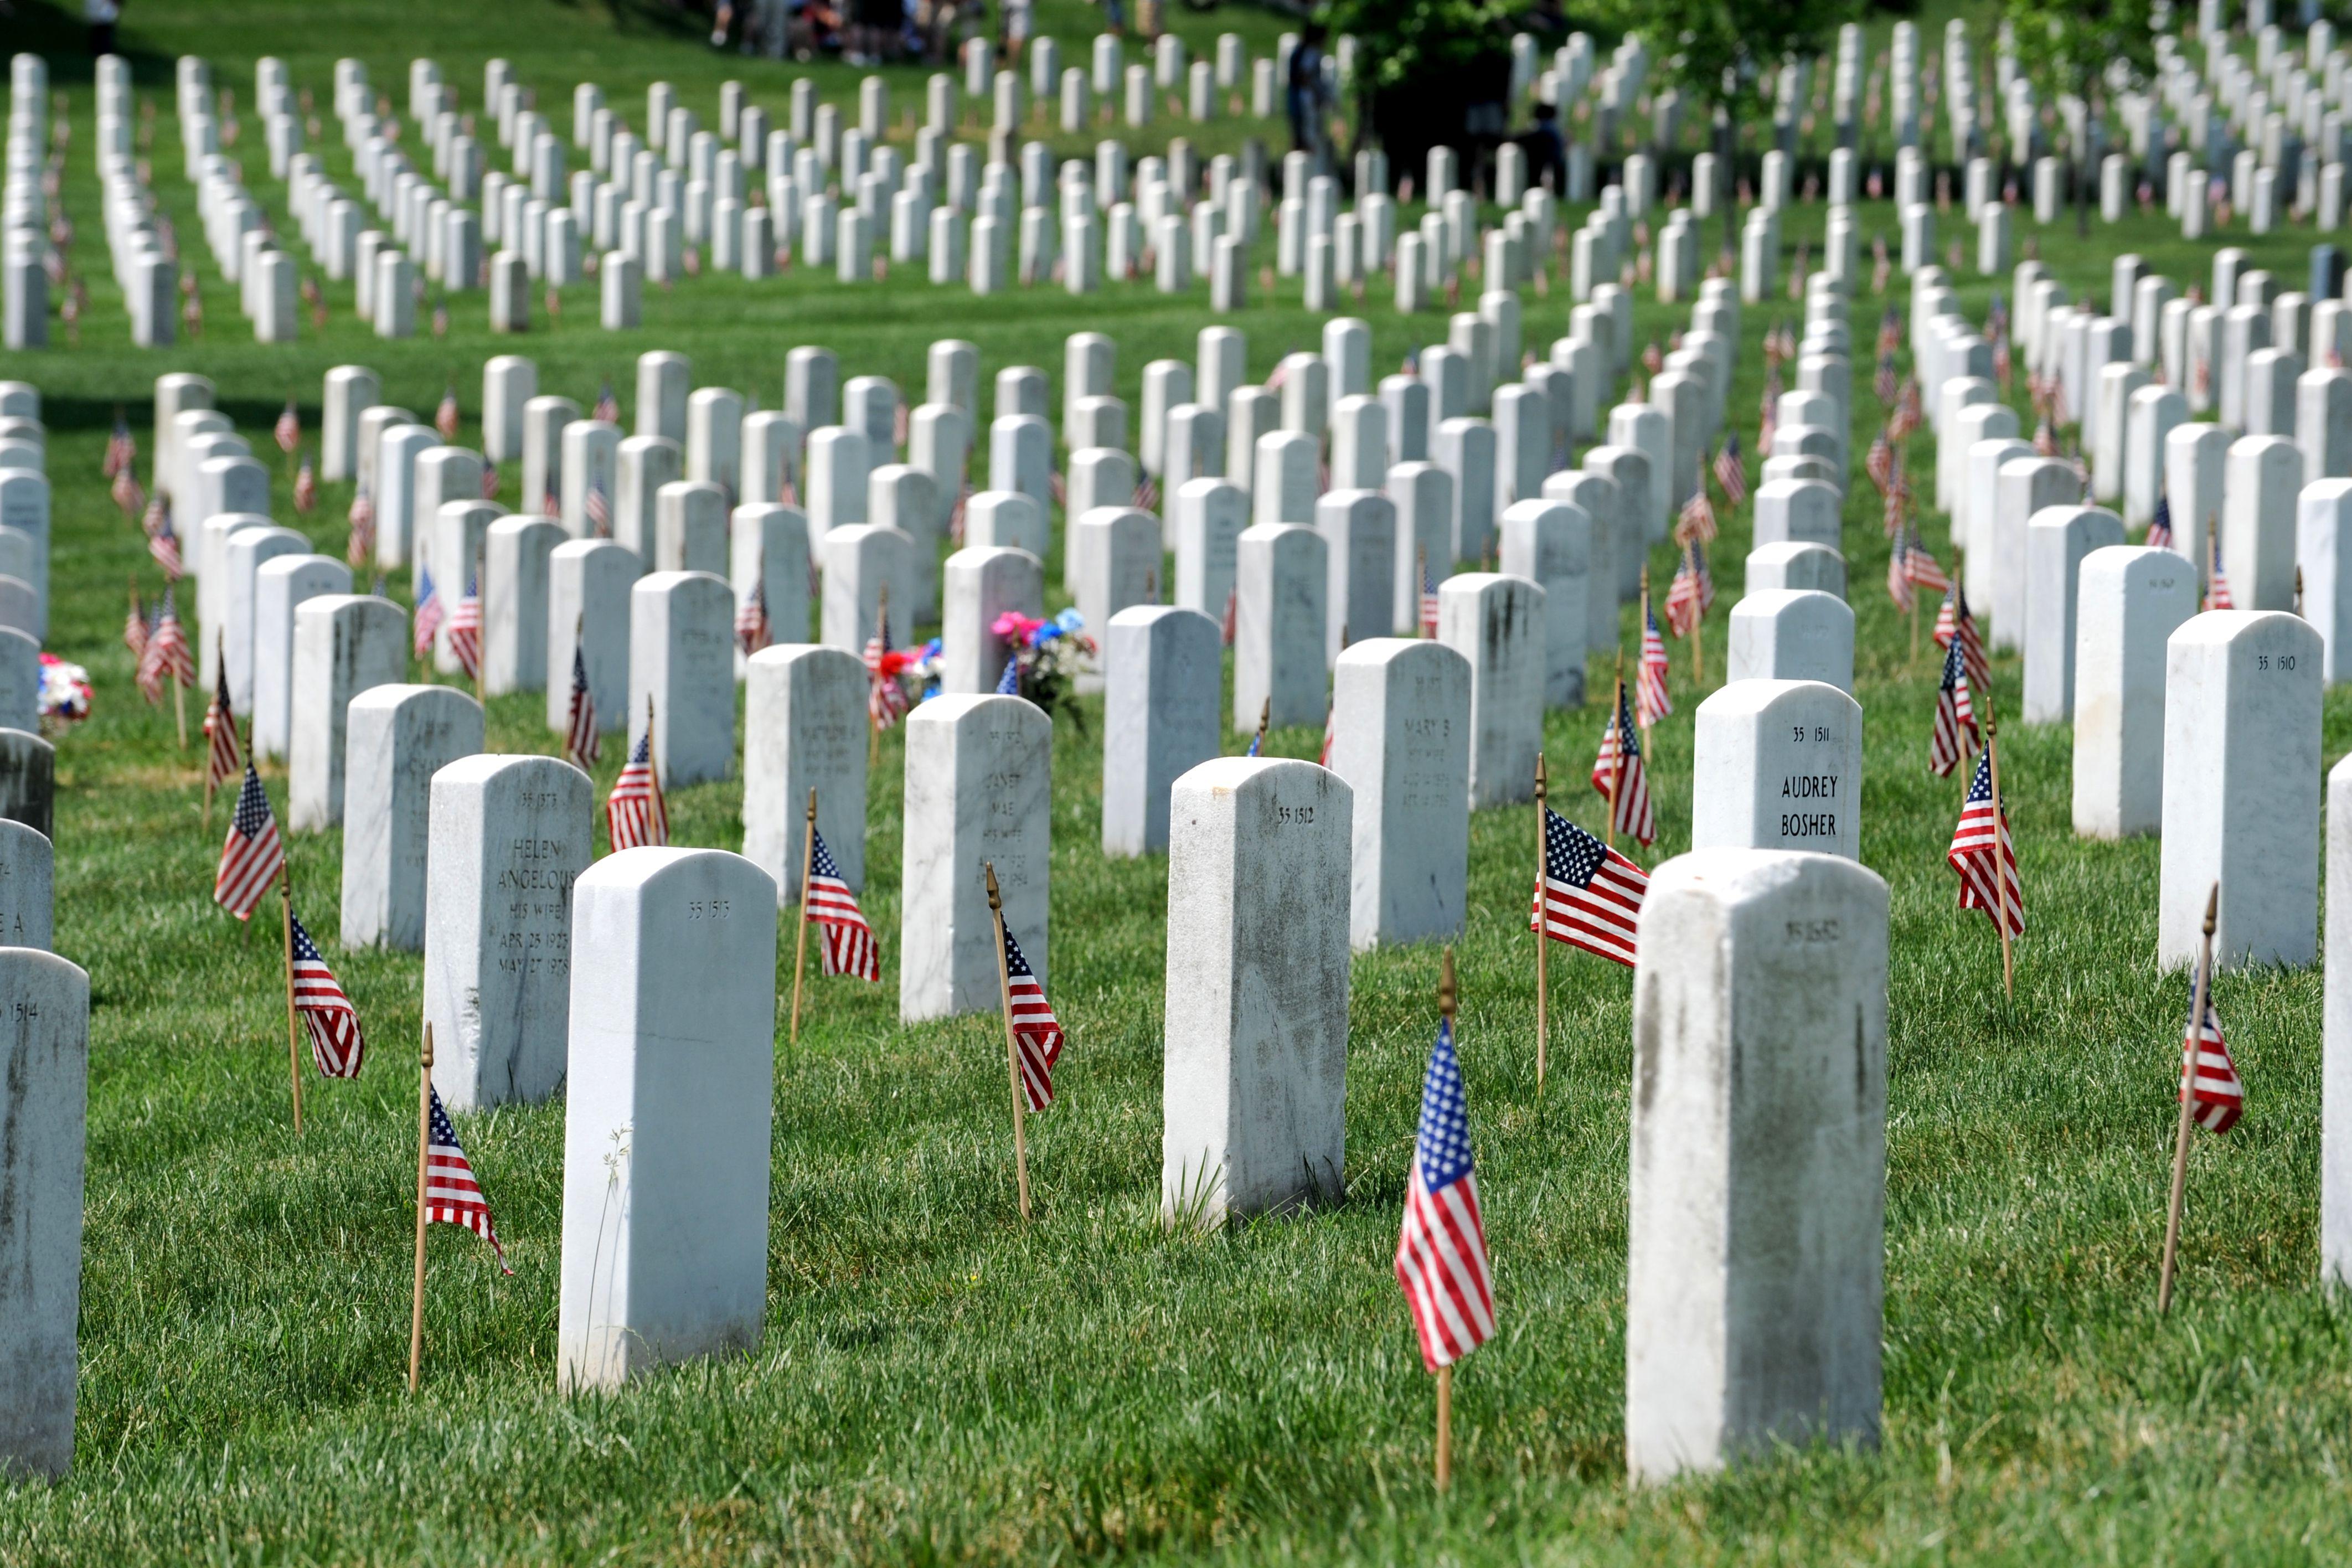 American Flags decorate graves on Memorial Day 2010 at Arlington National Cemetery in Arlington, Va.